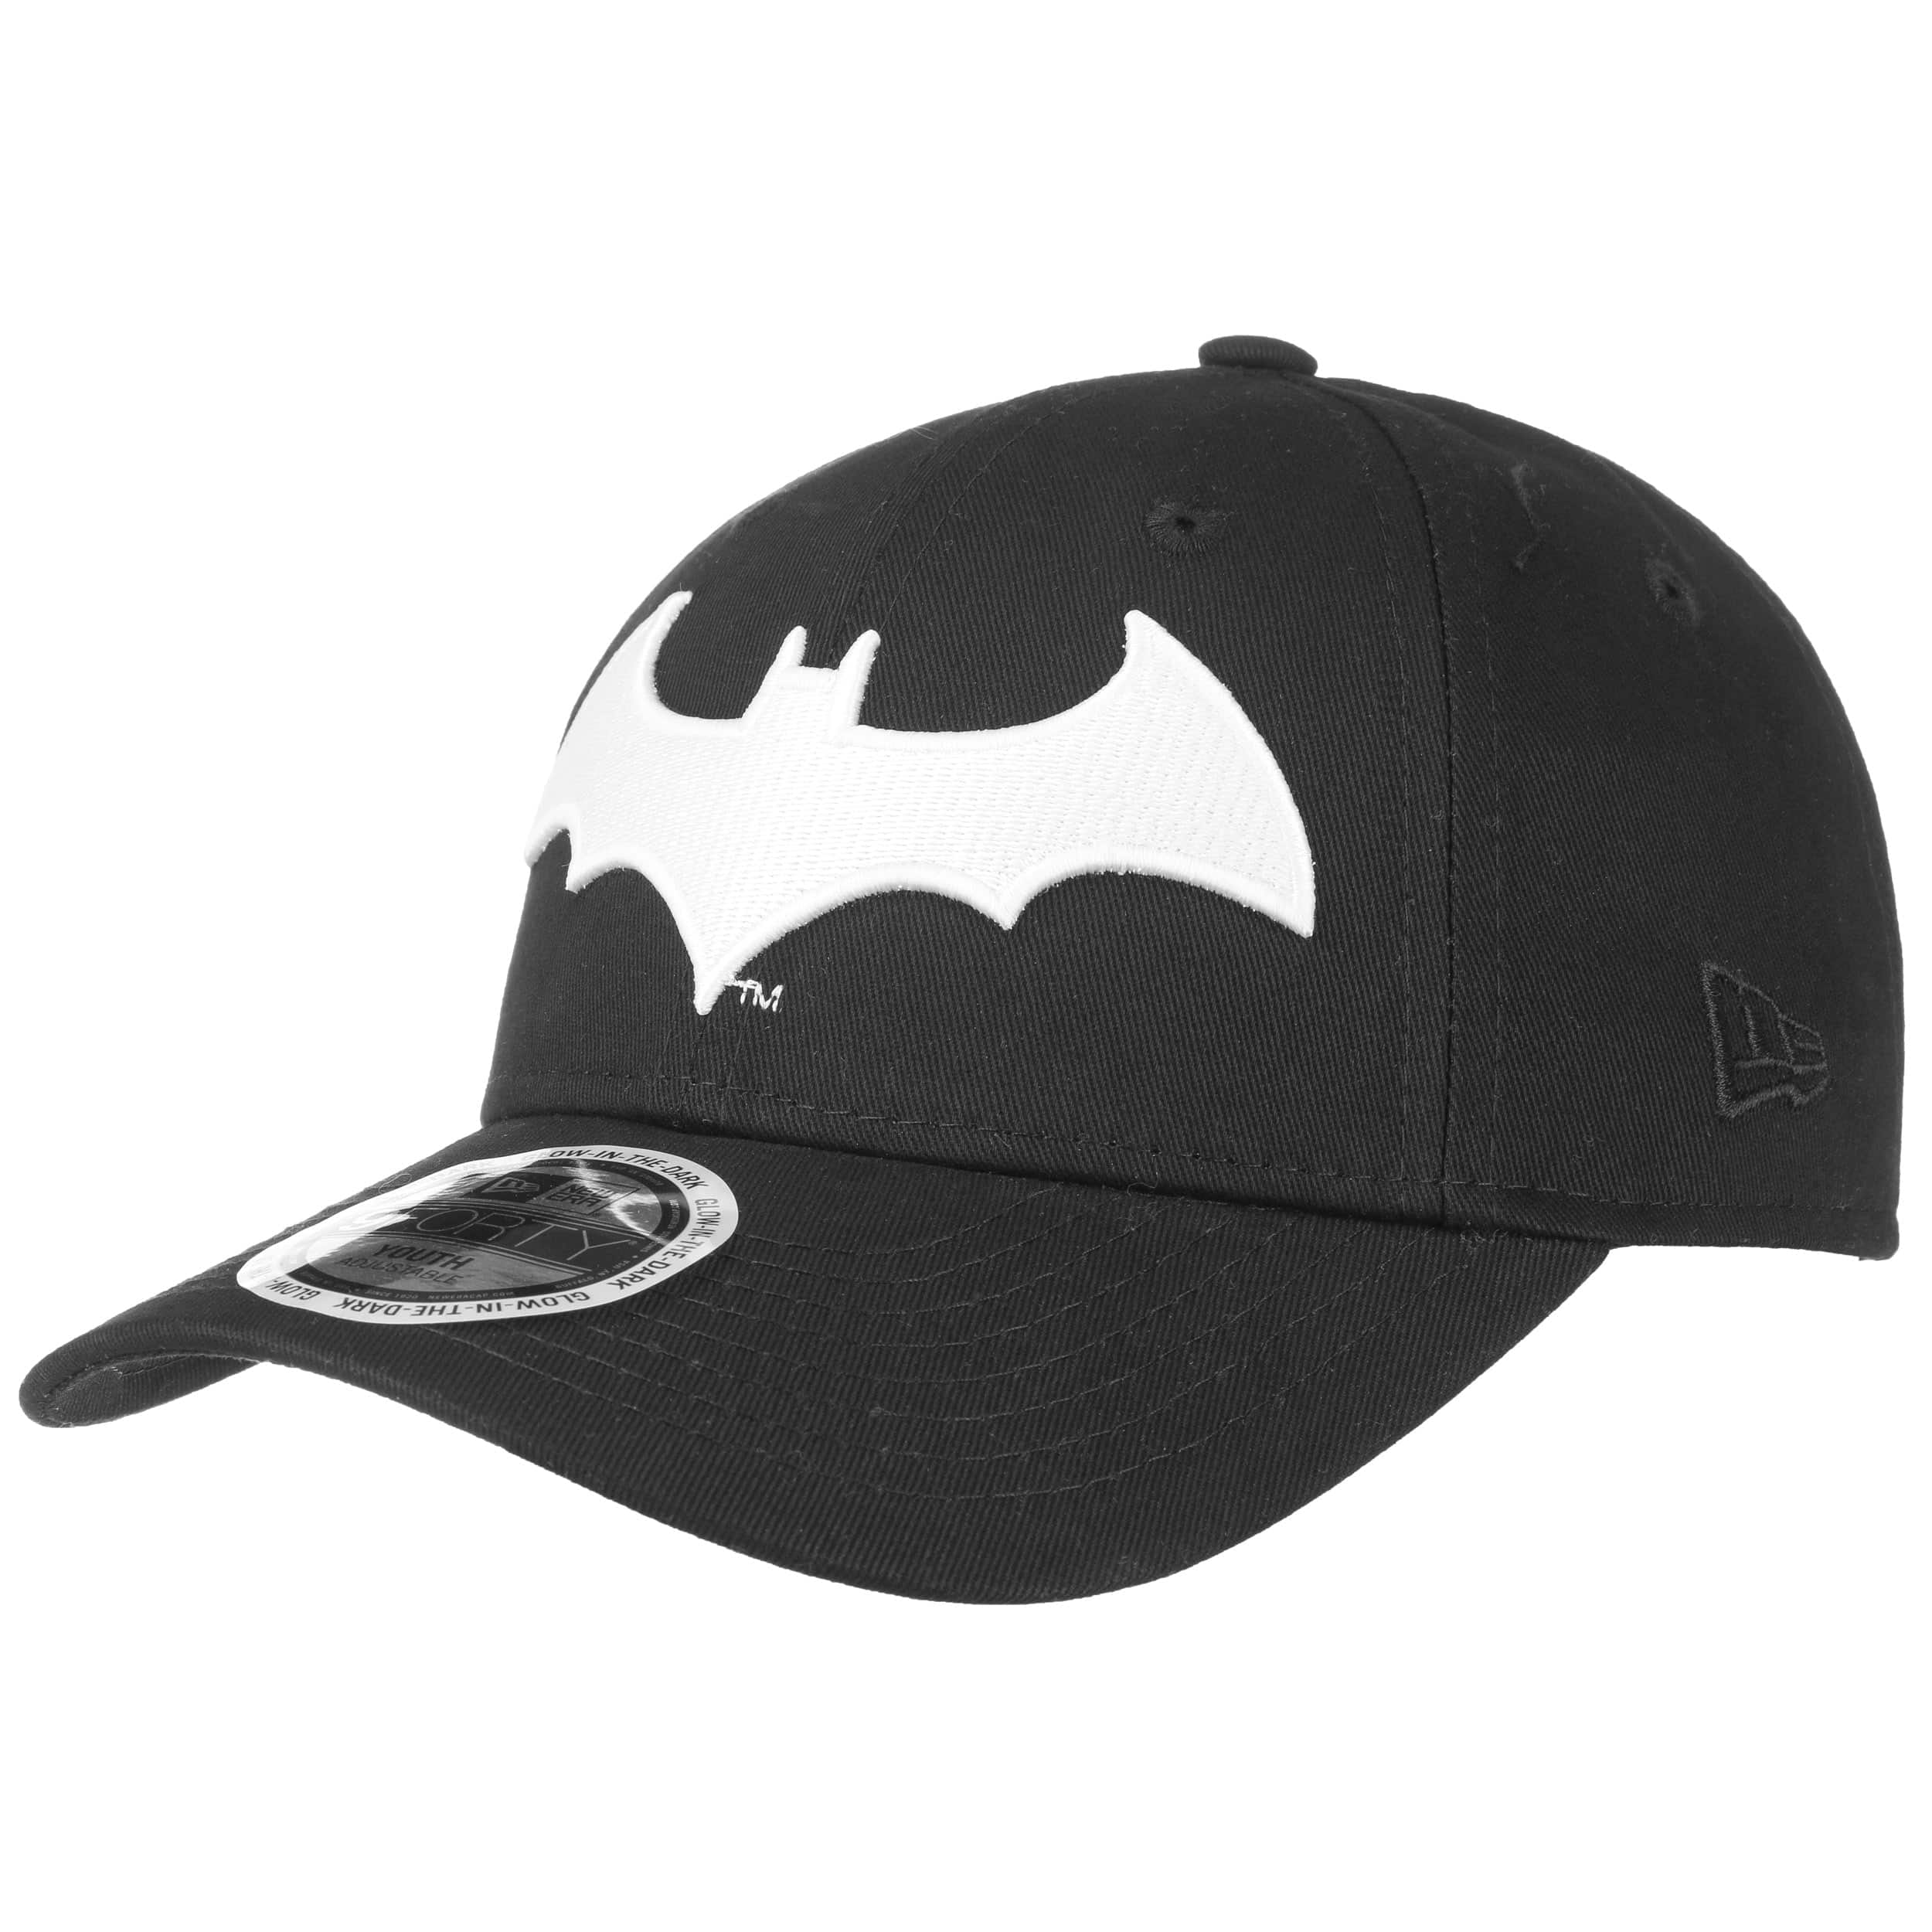 Gorra 9Forty Junior GITD Batman by New Era - Gorras - sombreroshop.es 4aaeb33e6ee